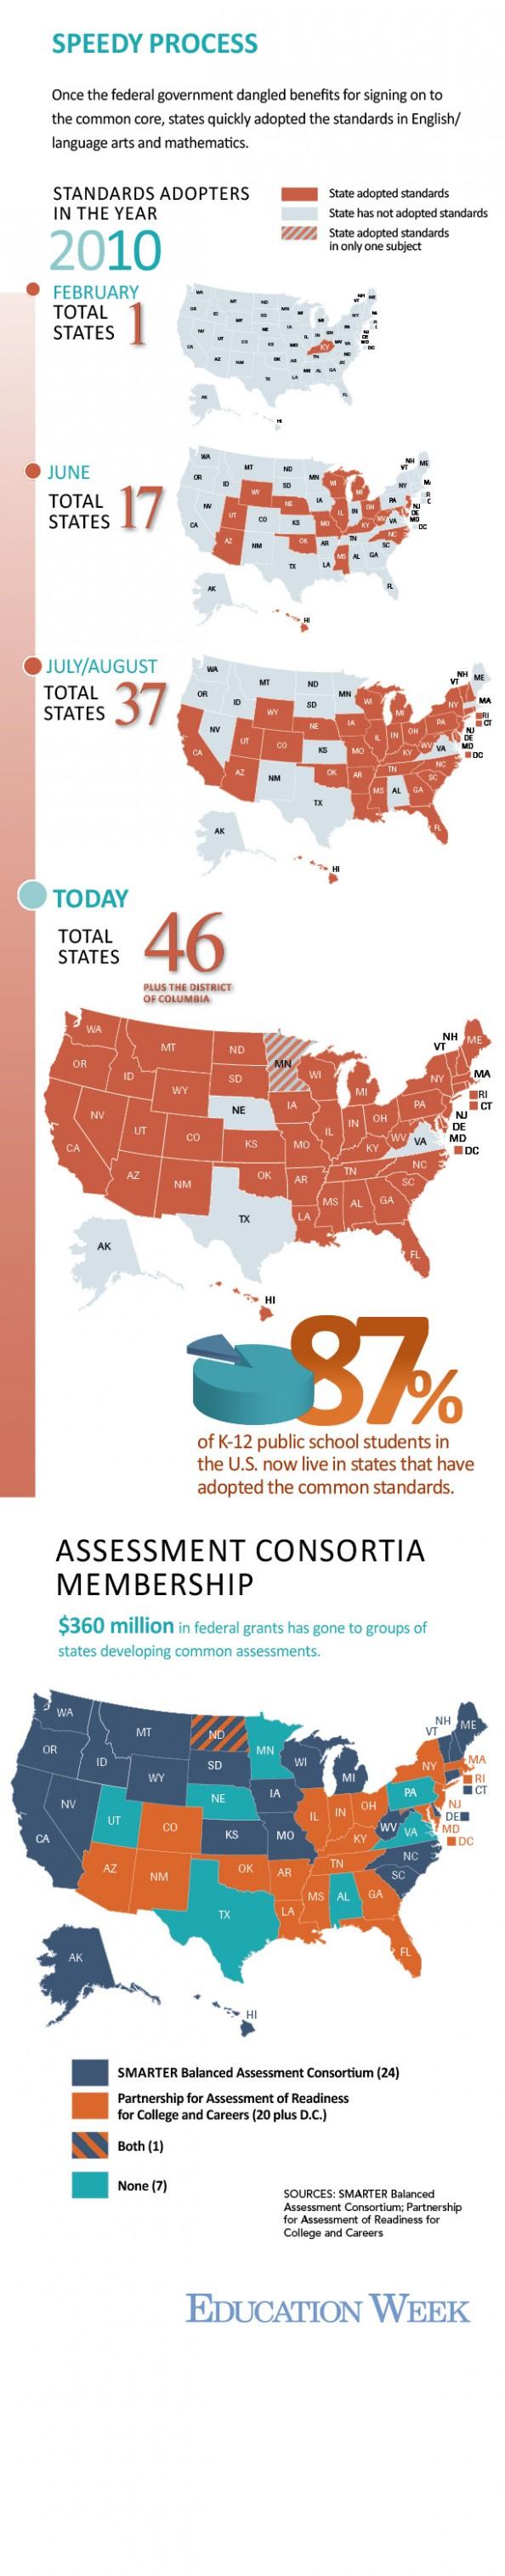 Speedy Process For Common Standards Adoption Infographic Common Core State Standards Adoption Education Week [ 3028 x 594 Pixel ]